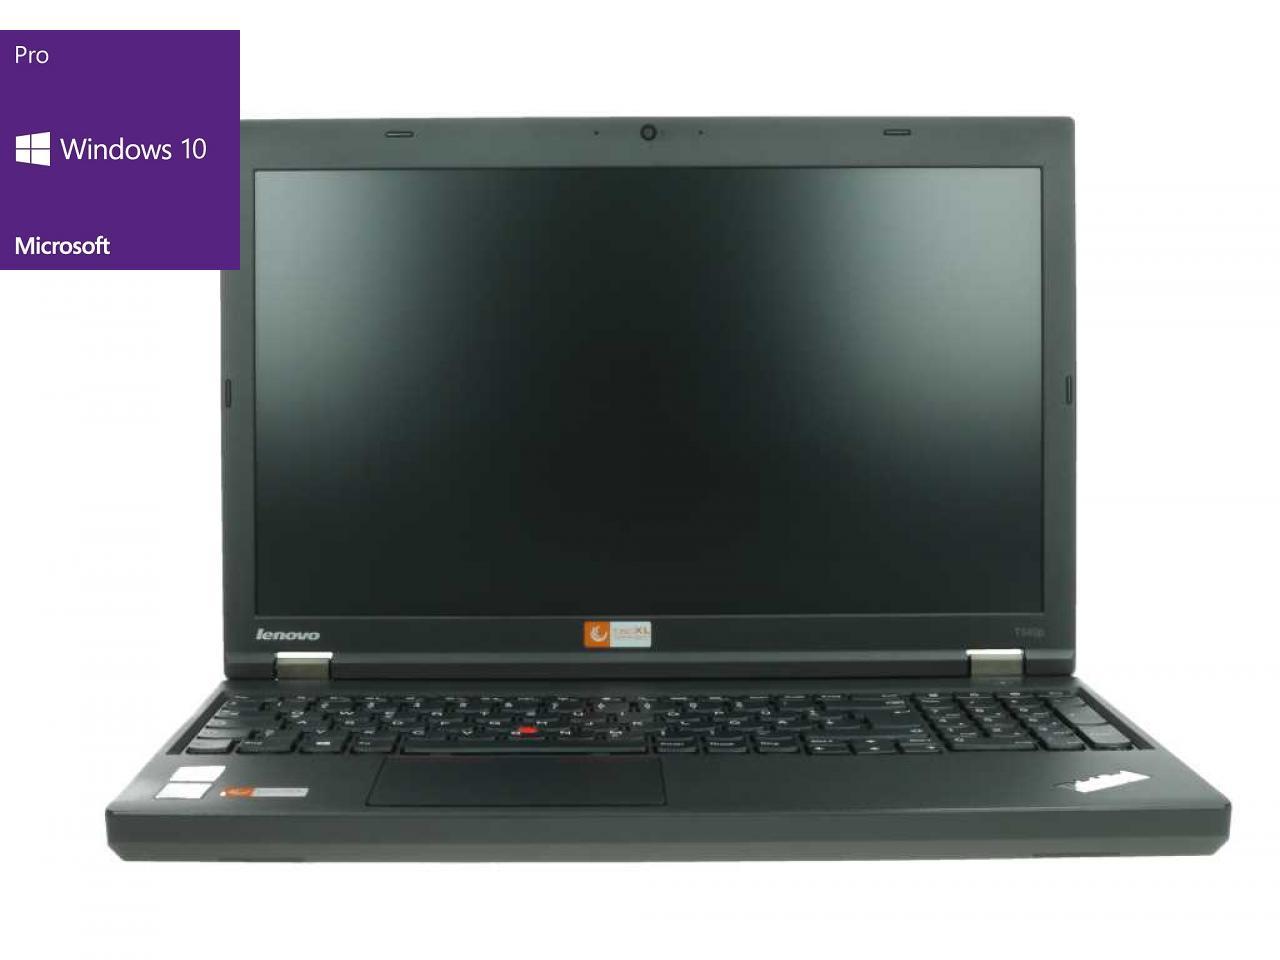 Lenovo ThinkPad T540p  - shop.bb-net.de